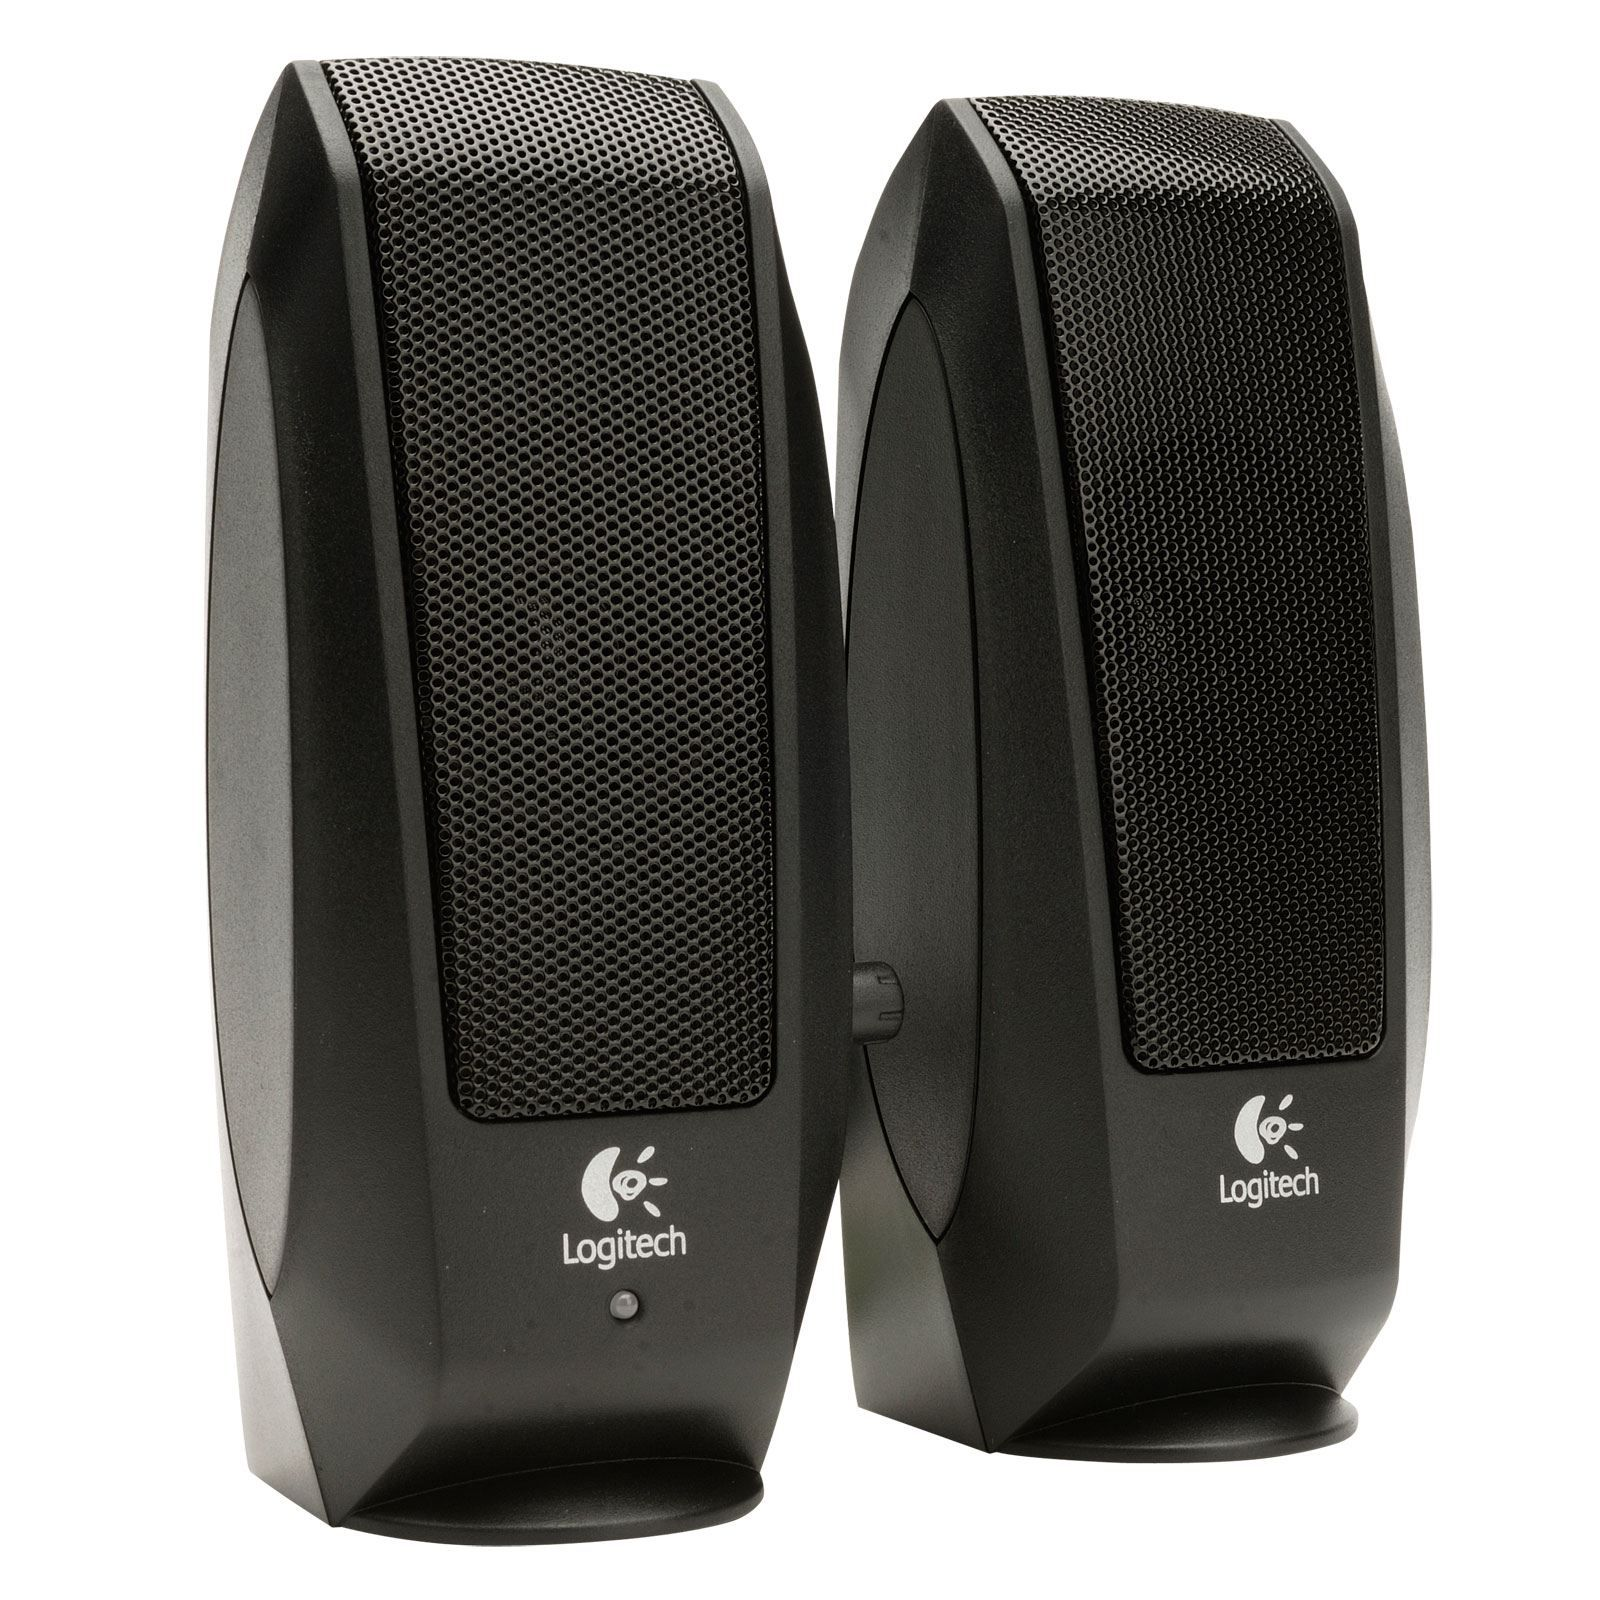 Logitech 980 000012 s120 2 piece black desktop computer speaker set - Logitech S120 Pc Speakers Brilliant Price Of 16 00